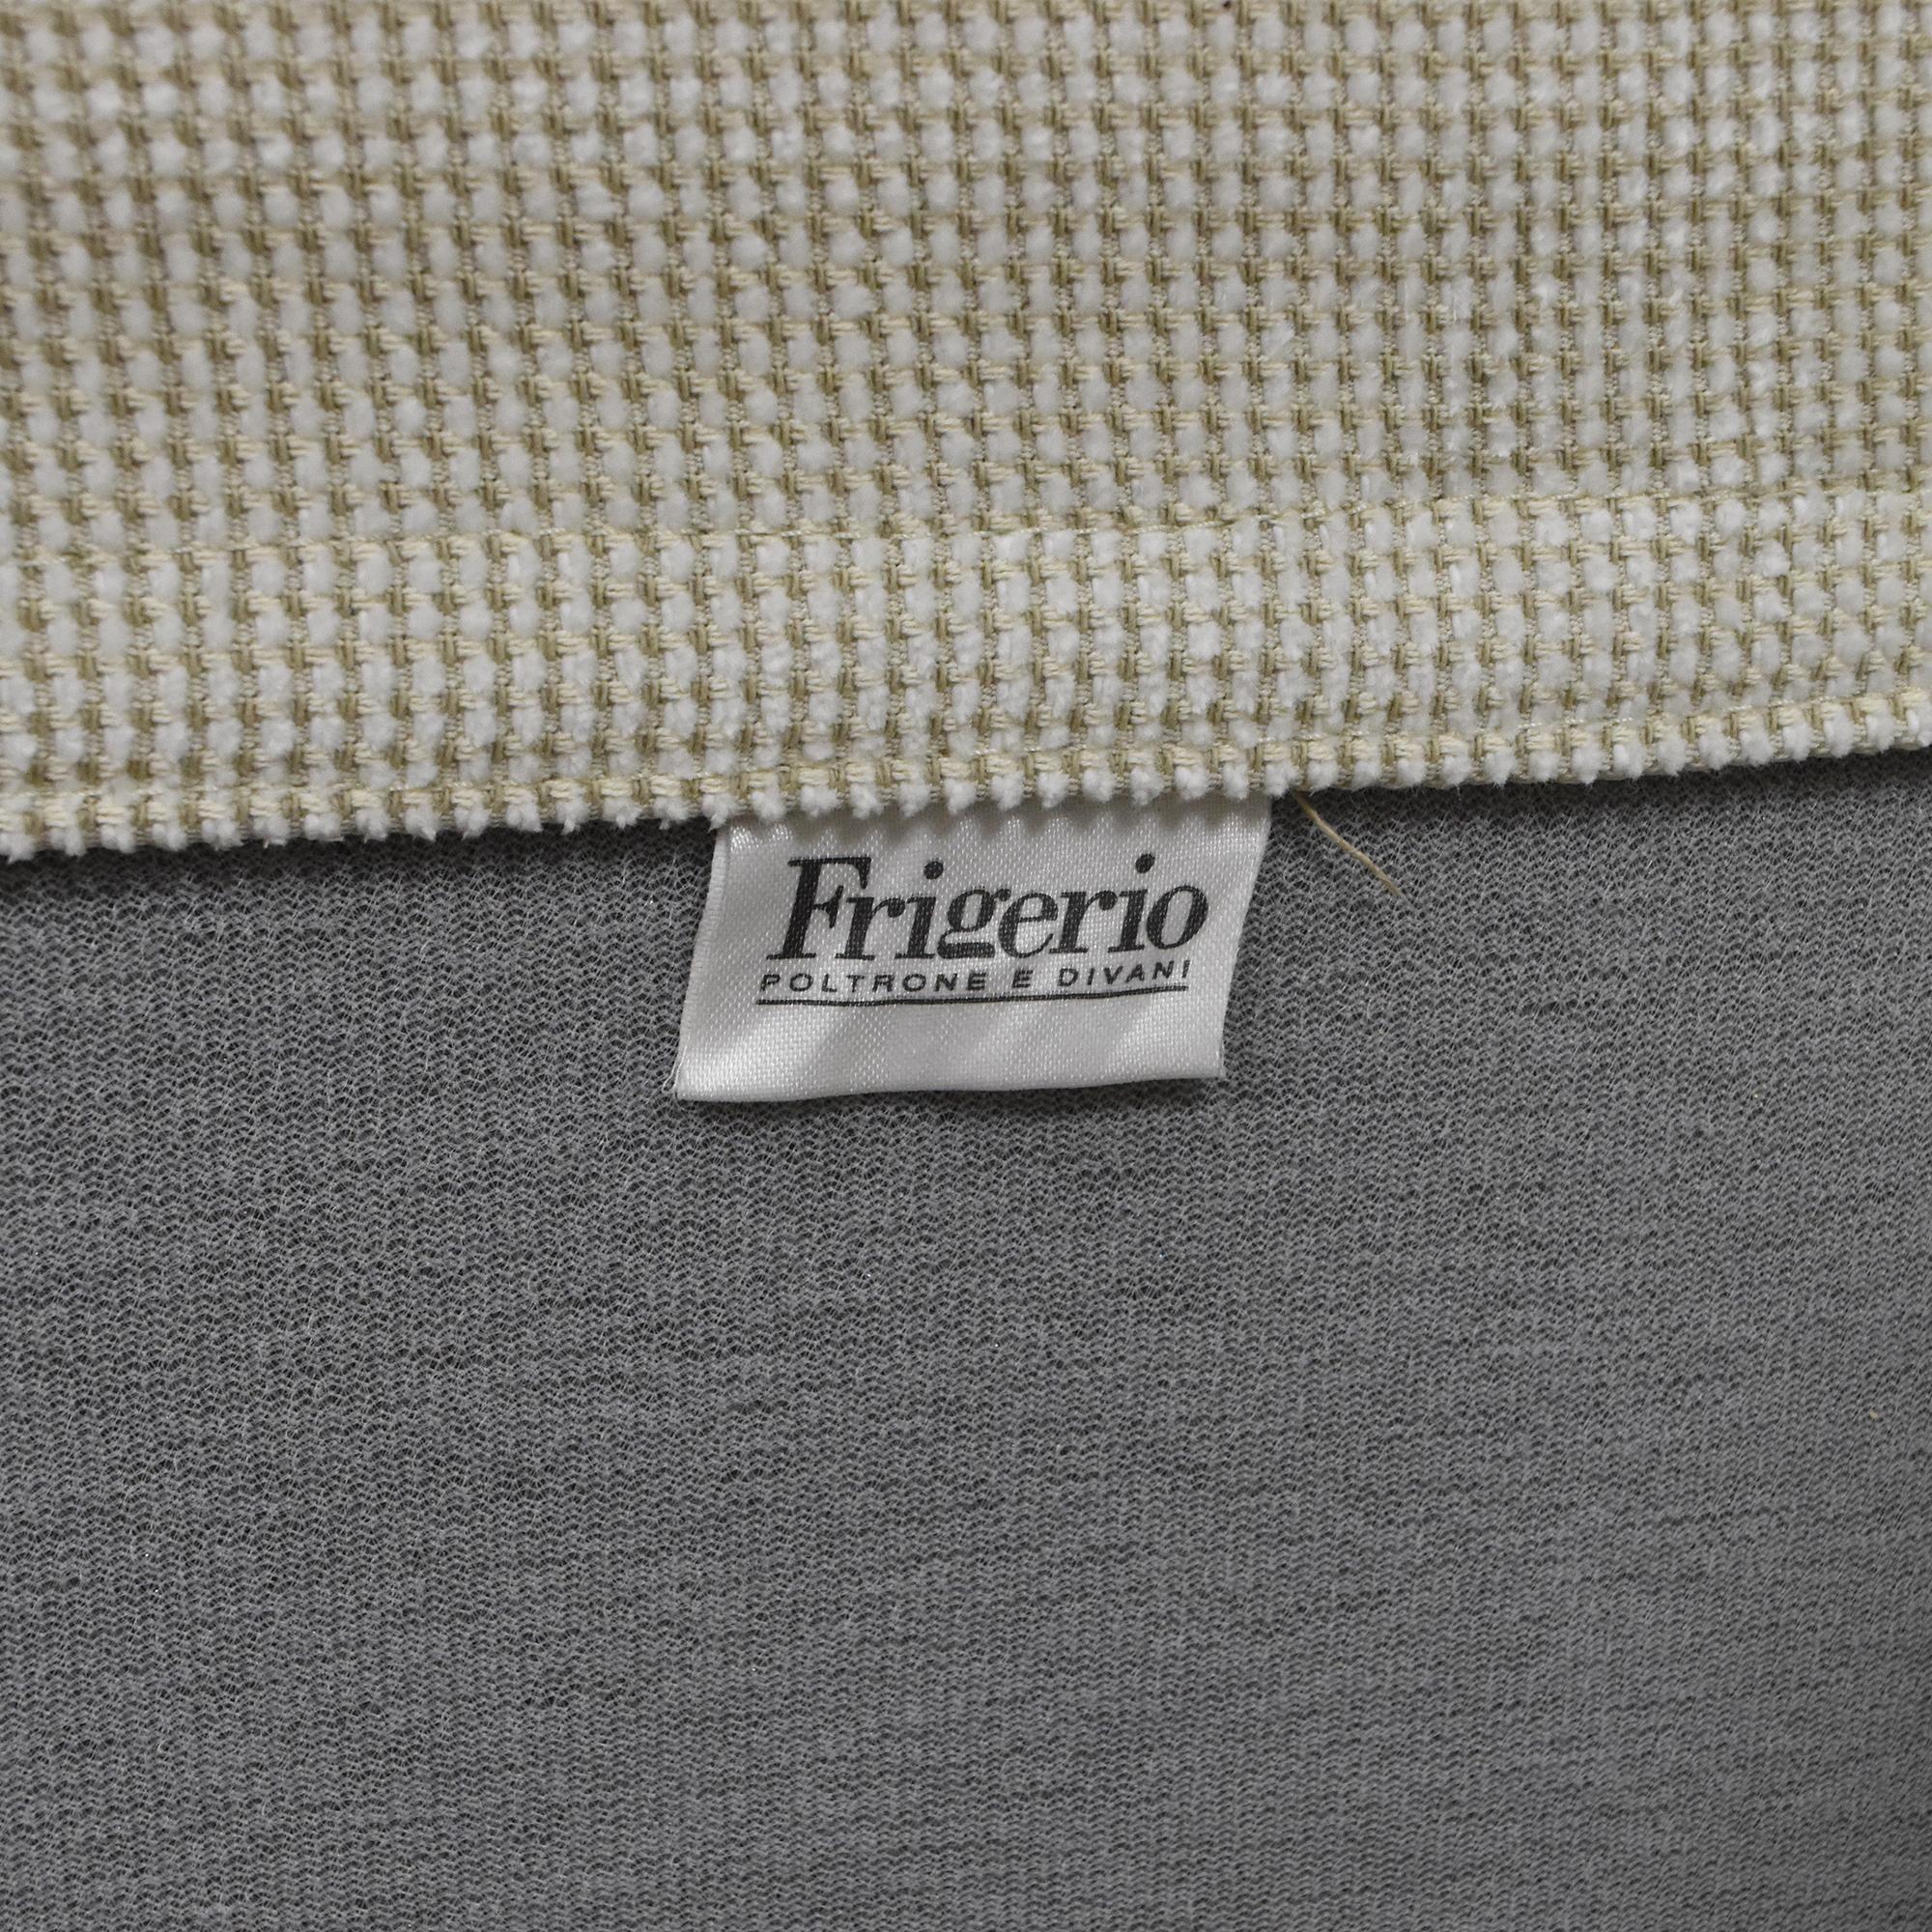 buy Frigerio Frigerio Modern Two Piece Sectional Sofa online